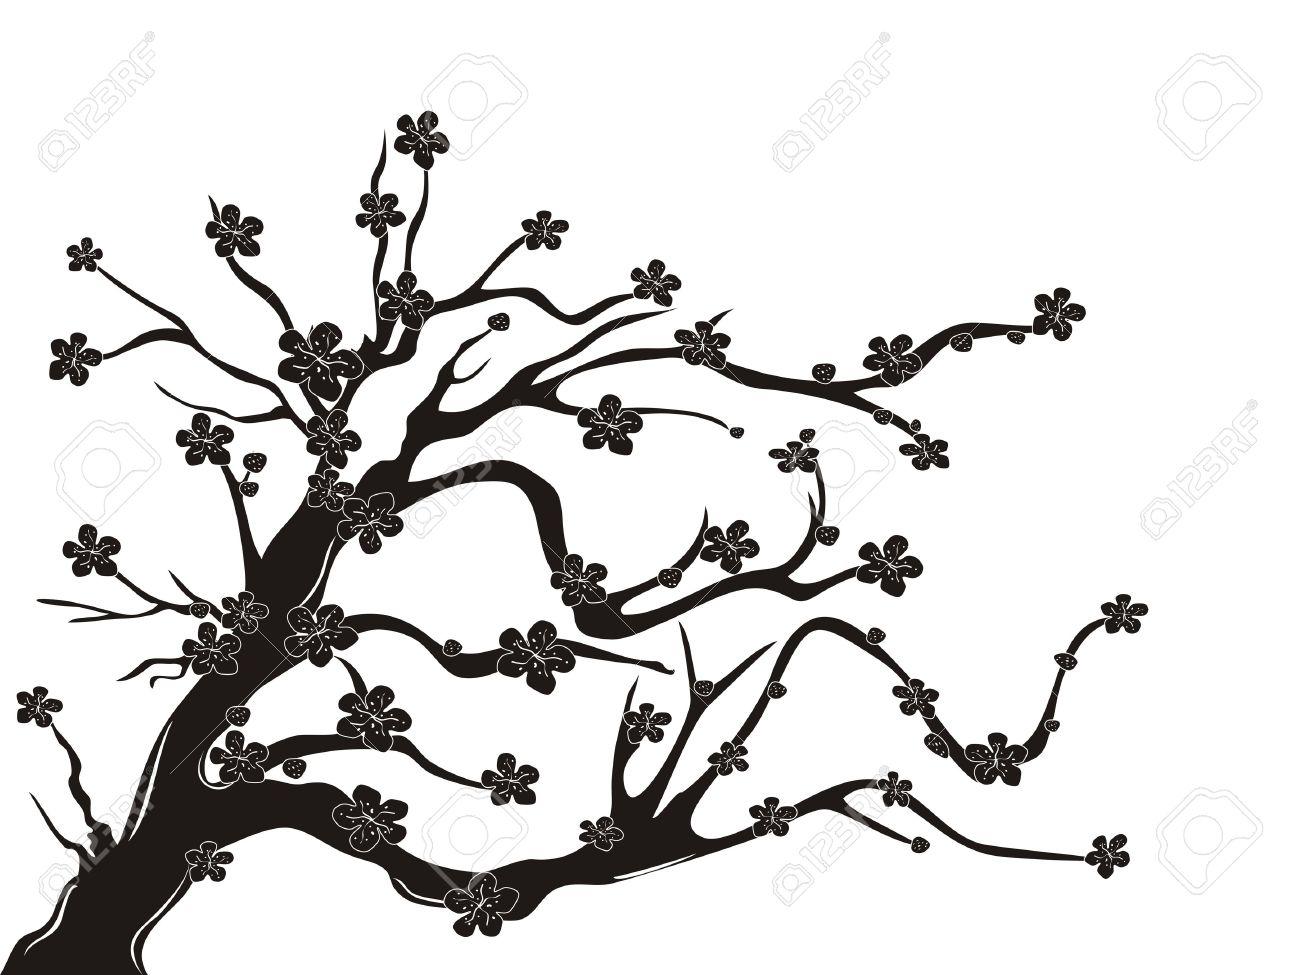 Cherry blossom clipart black and white.